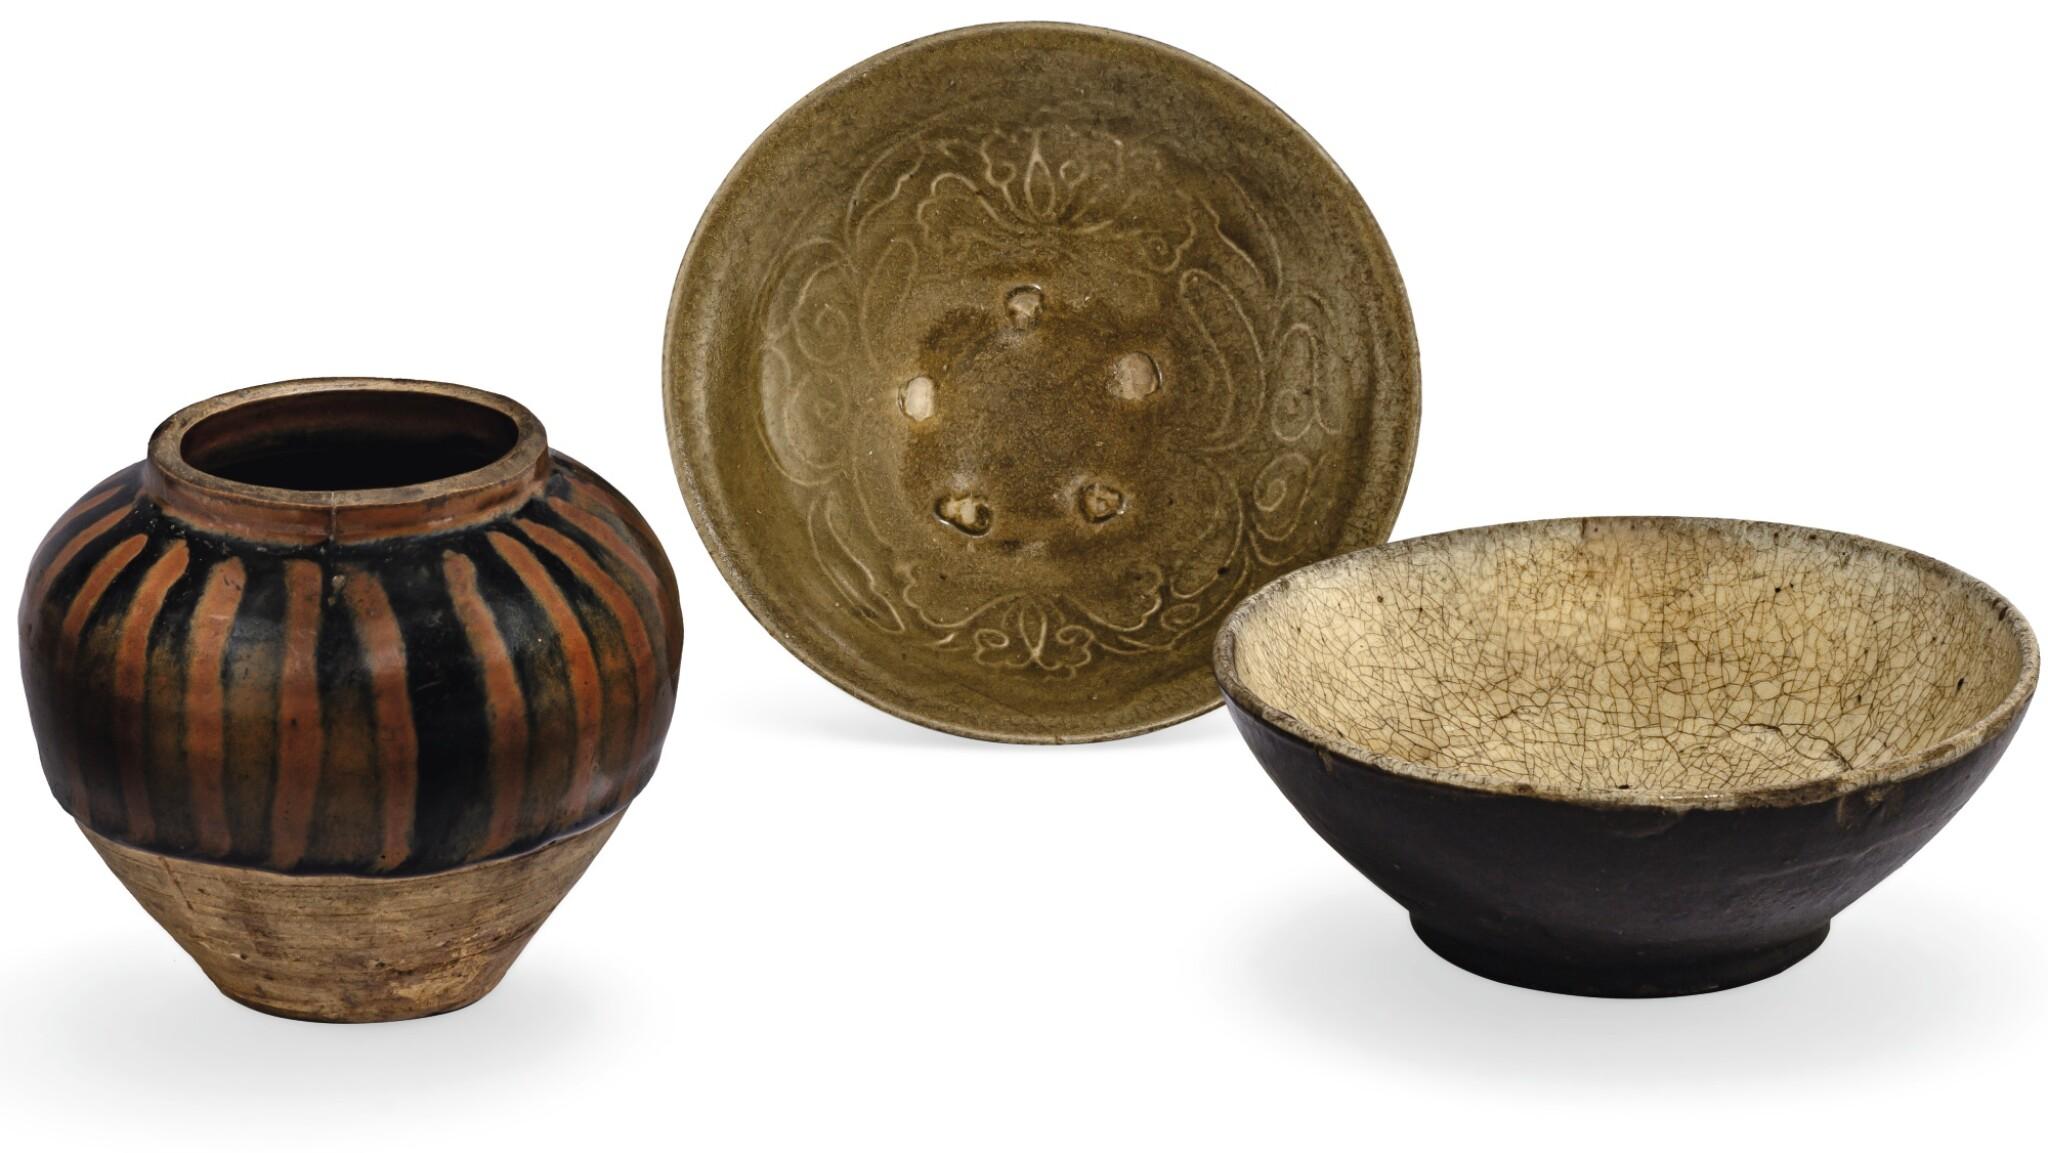 View full screen - View 1 of Lot 3. BOL MOULÉ À GLAÇURE CÉLADON, JARRE À GLAÇURE NOIRE ET ROUILLE HENAN ET BOL À GLAÇURE NOIRE ET CRAQUELÉE DYNASTIE SONG  | 宋 陶器一組三件  | A moulded celadon-glazed bowl, a small henan russet-splashed jar and a black and crackled glazed bowl, Song Dynasty.